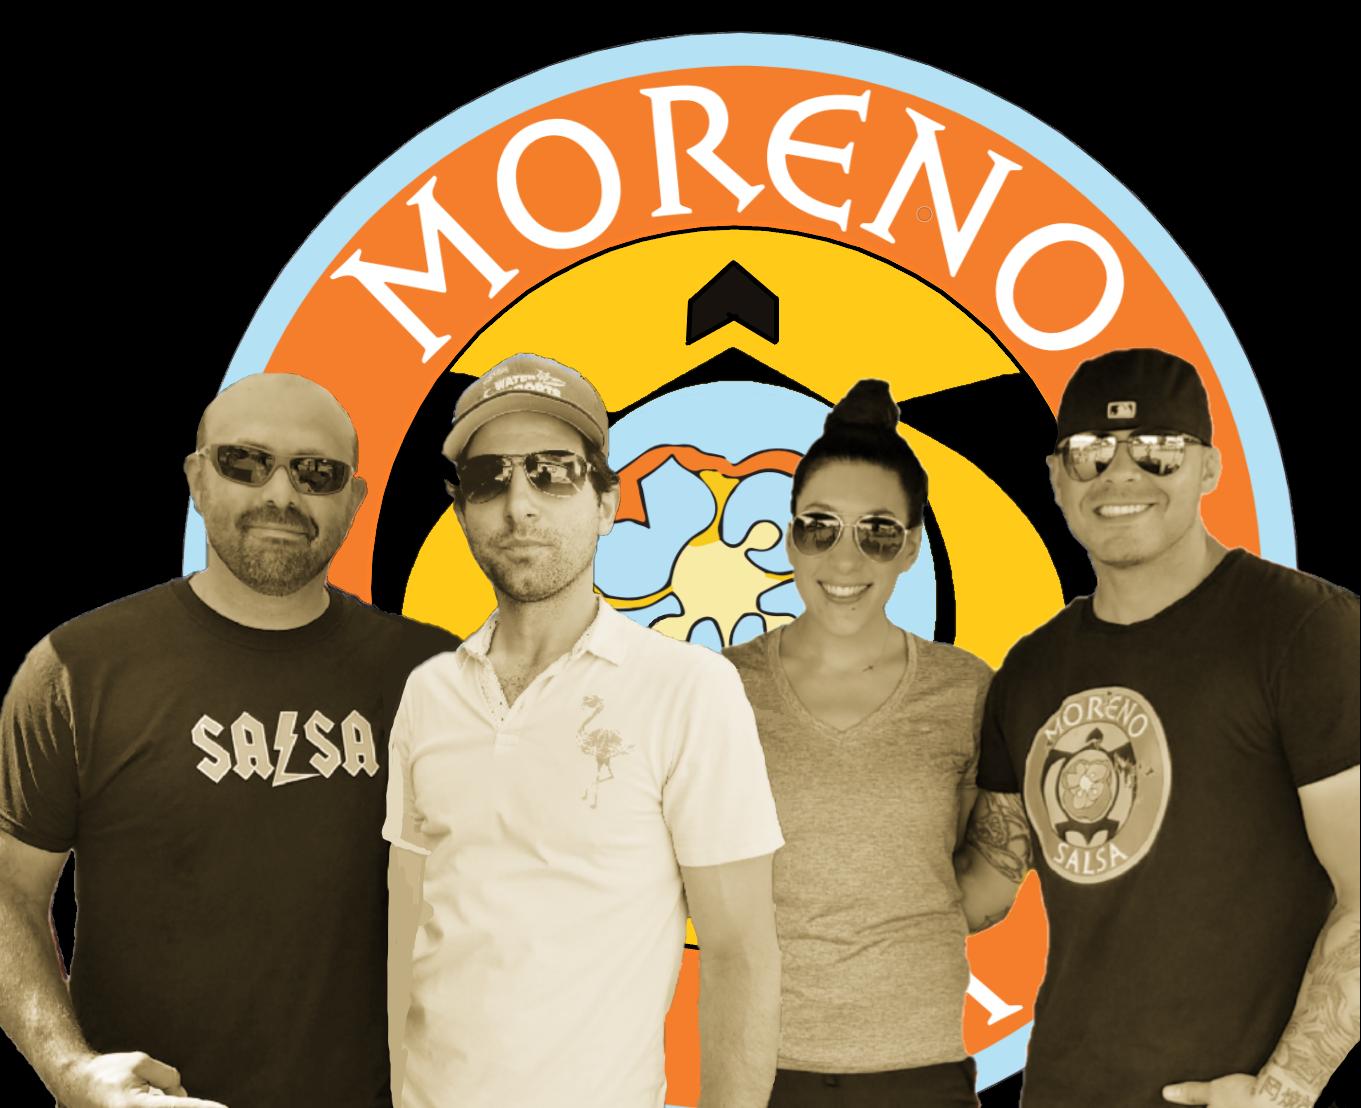 Our Story pic - Moreno Salsa